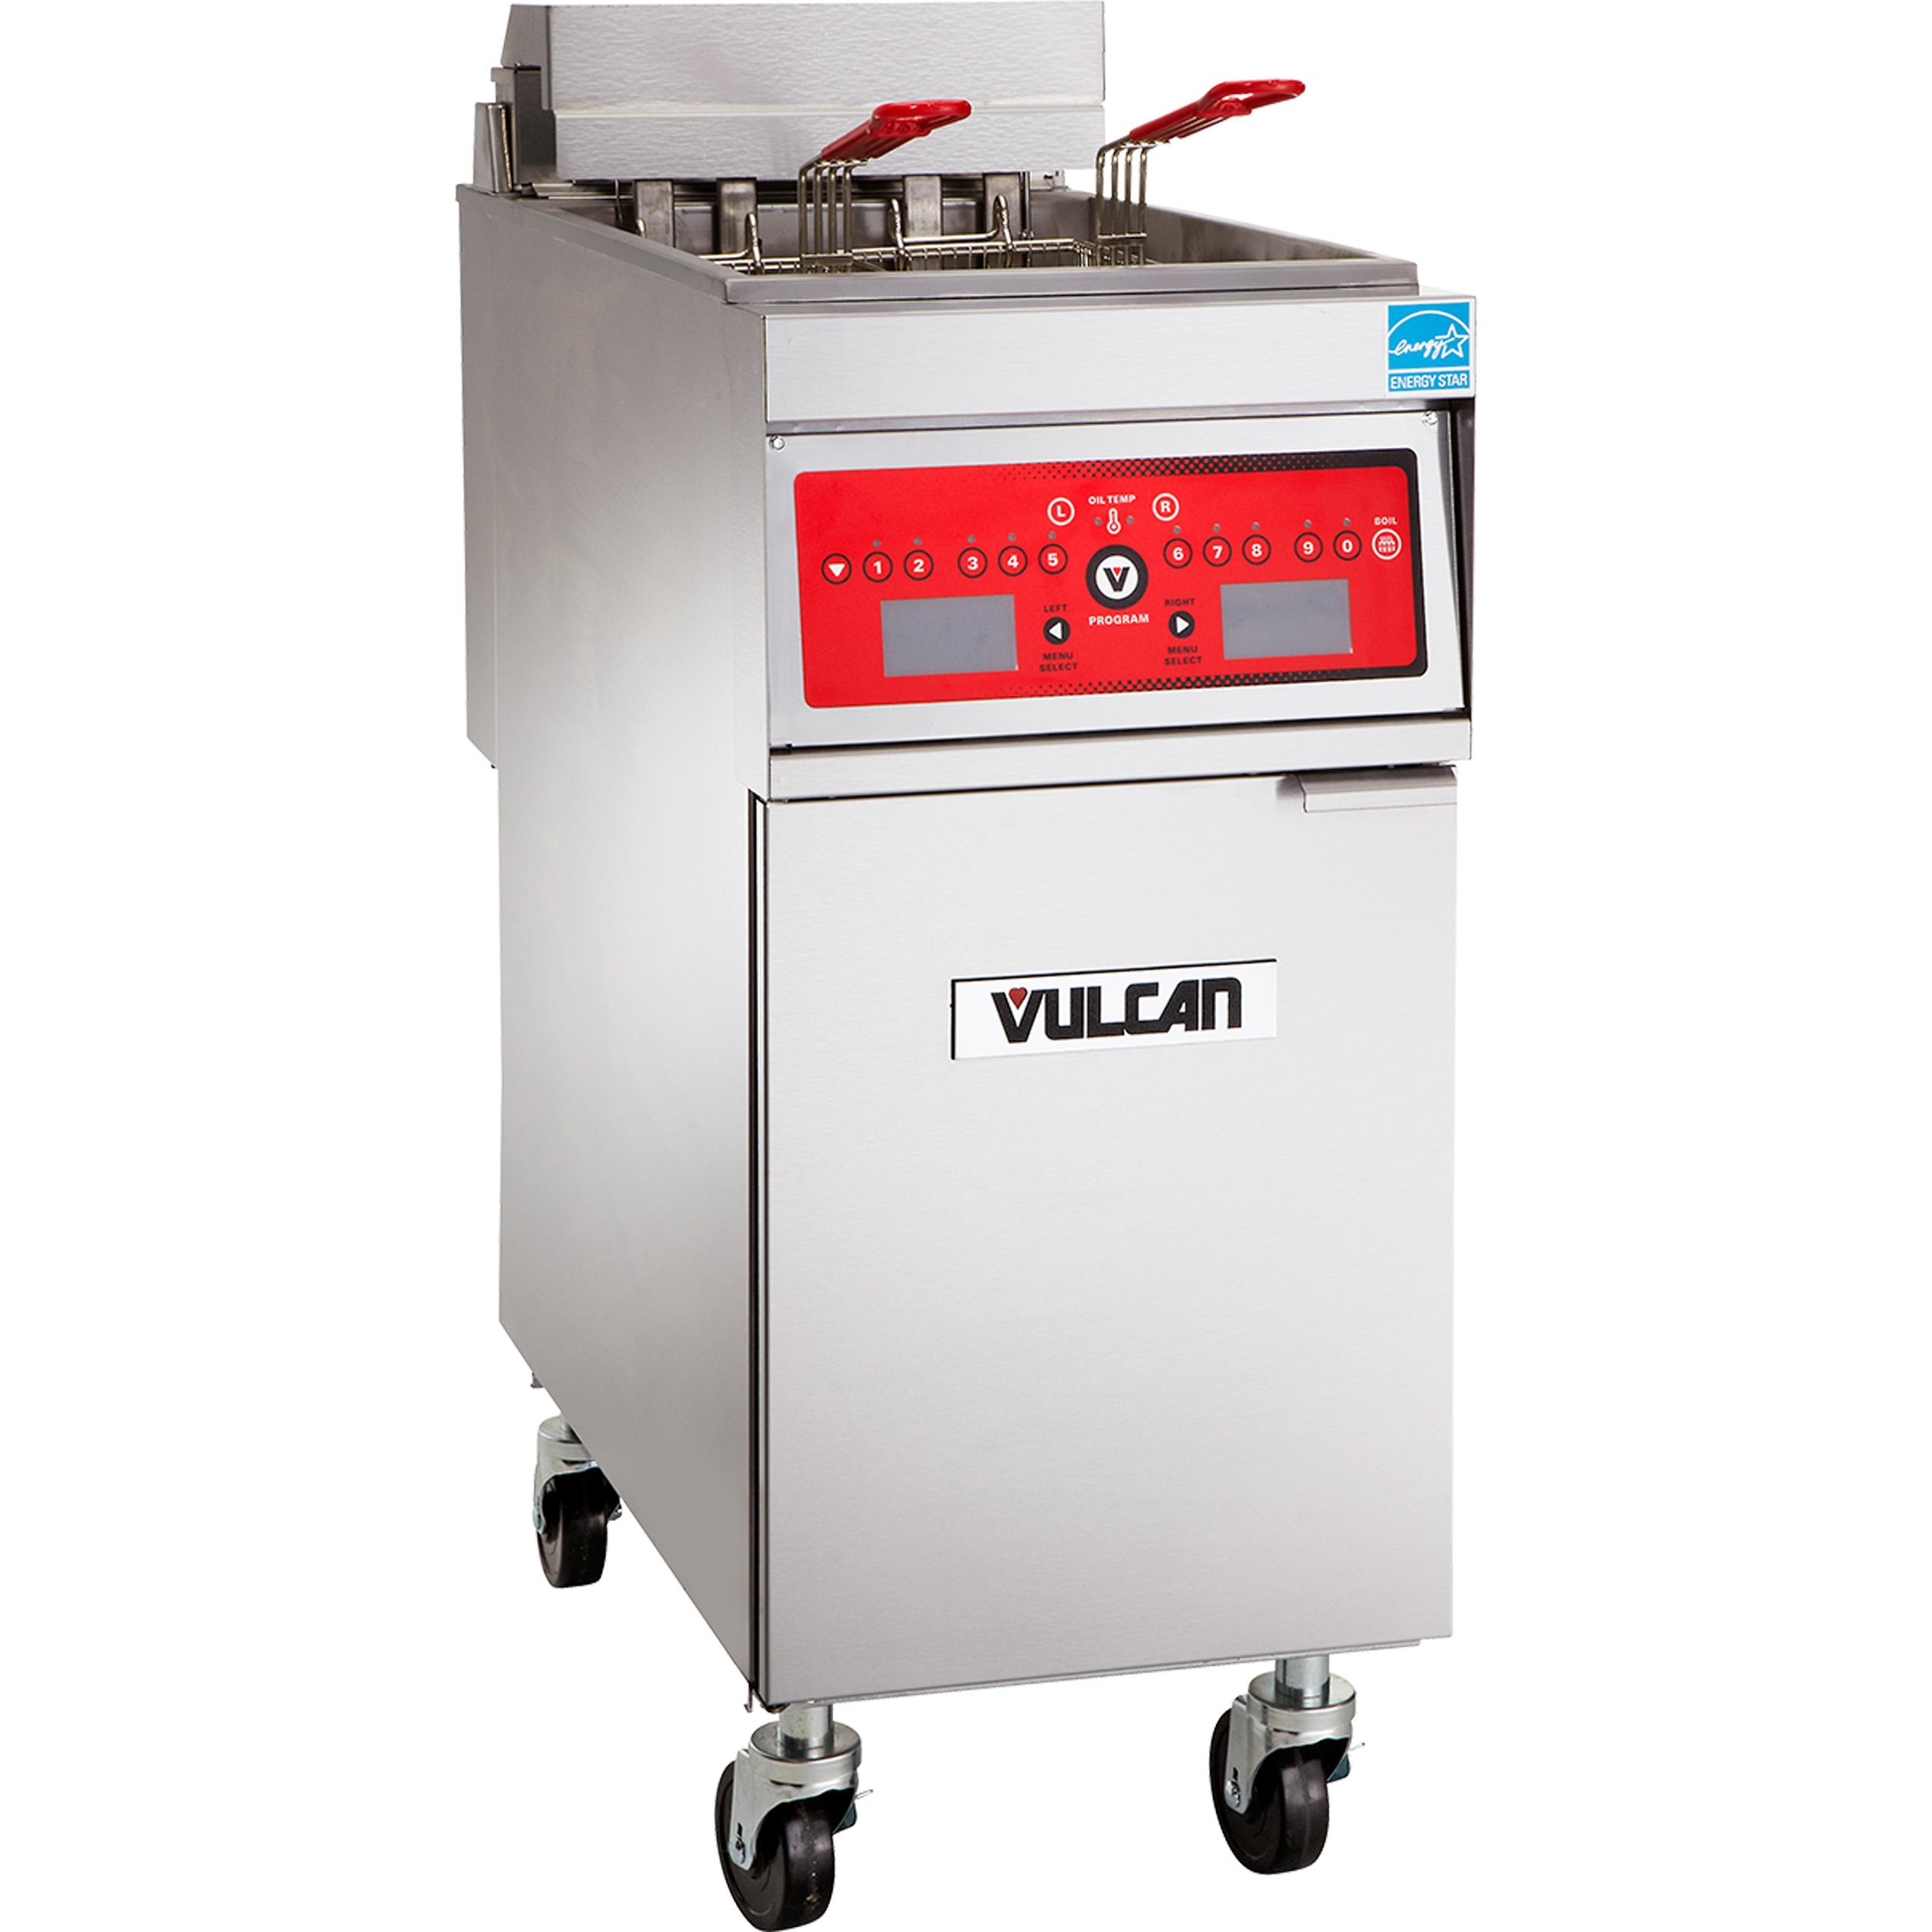 Vulcan 1ER50D fryer, electric, floor model, full pot